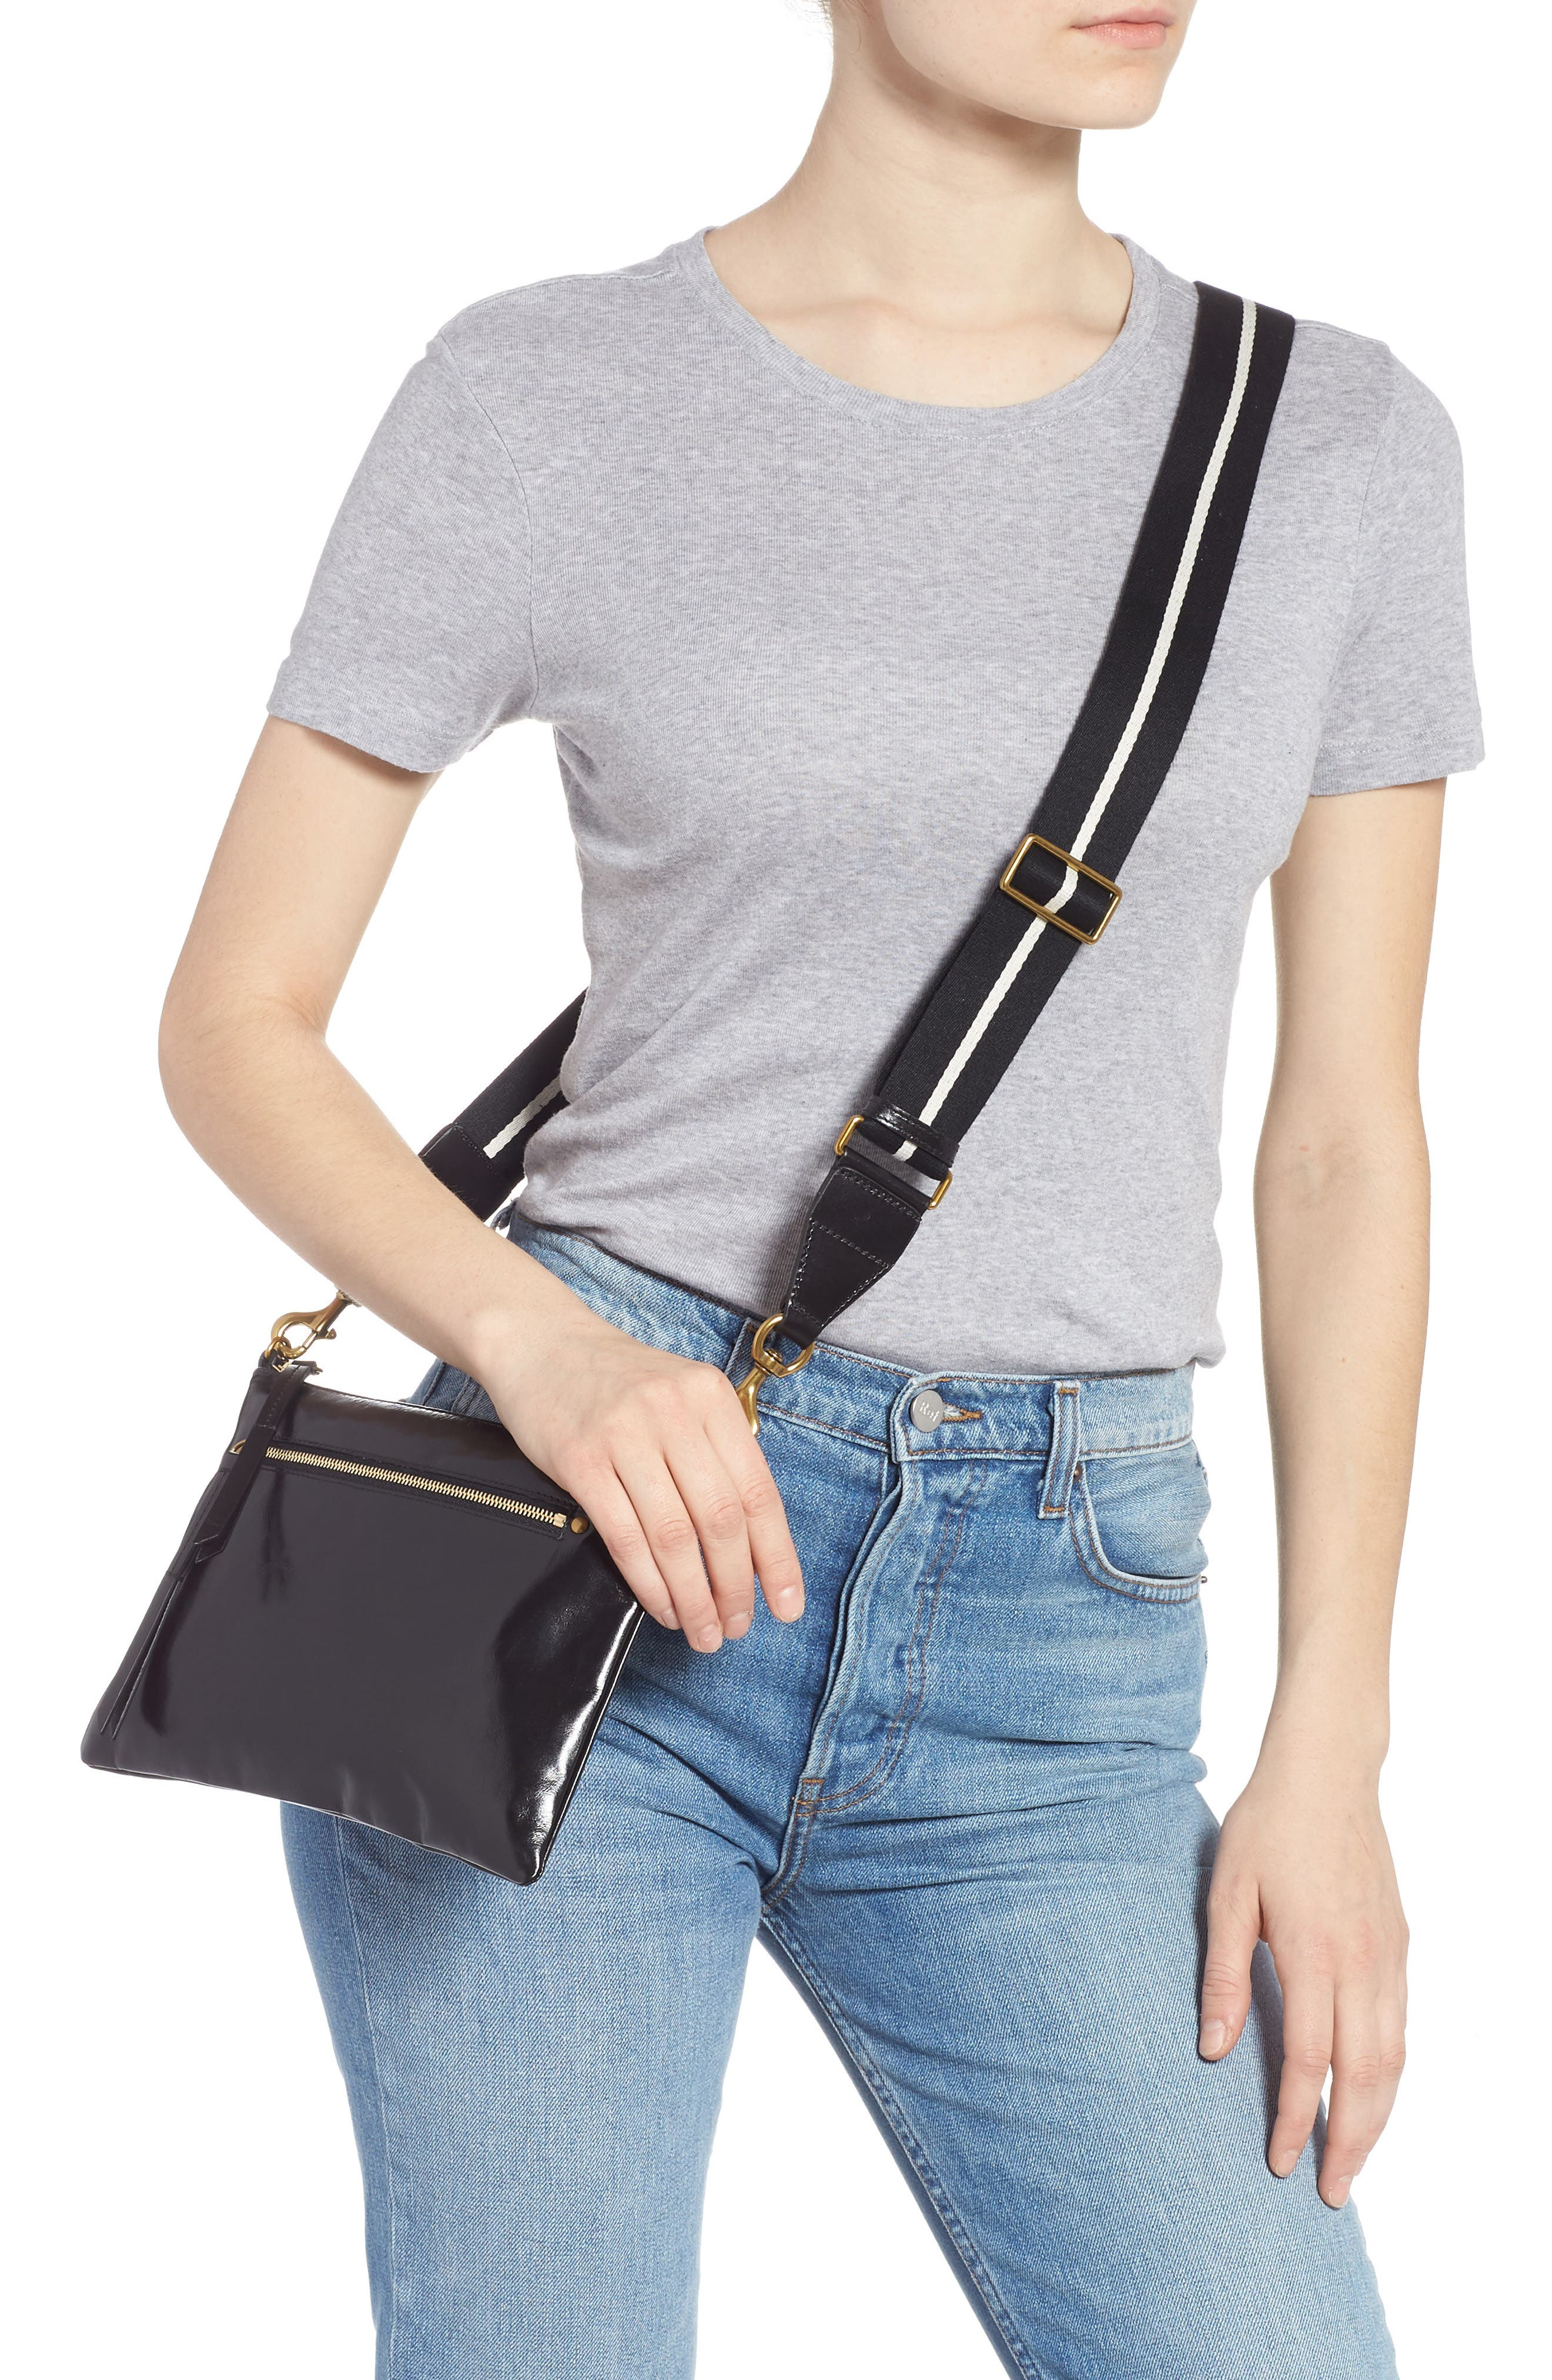 Nessah Leather Crossbody Bag,                         Main,                         color, 006